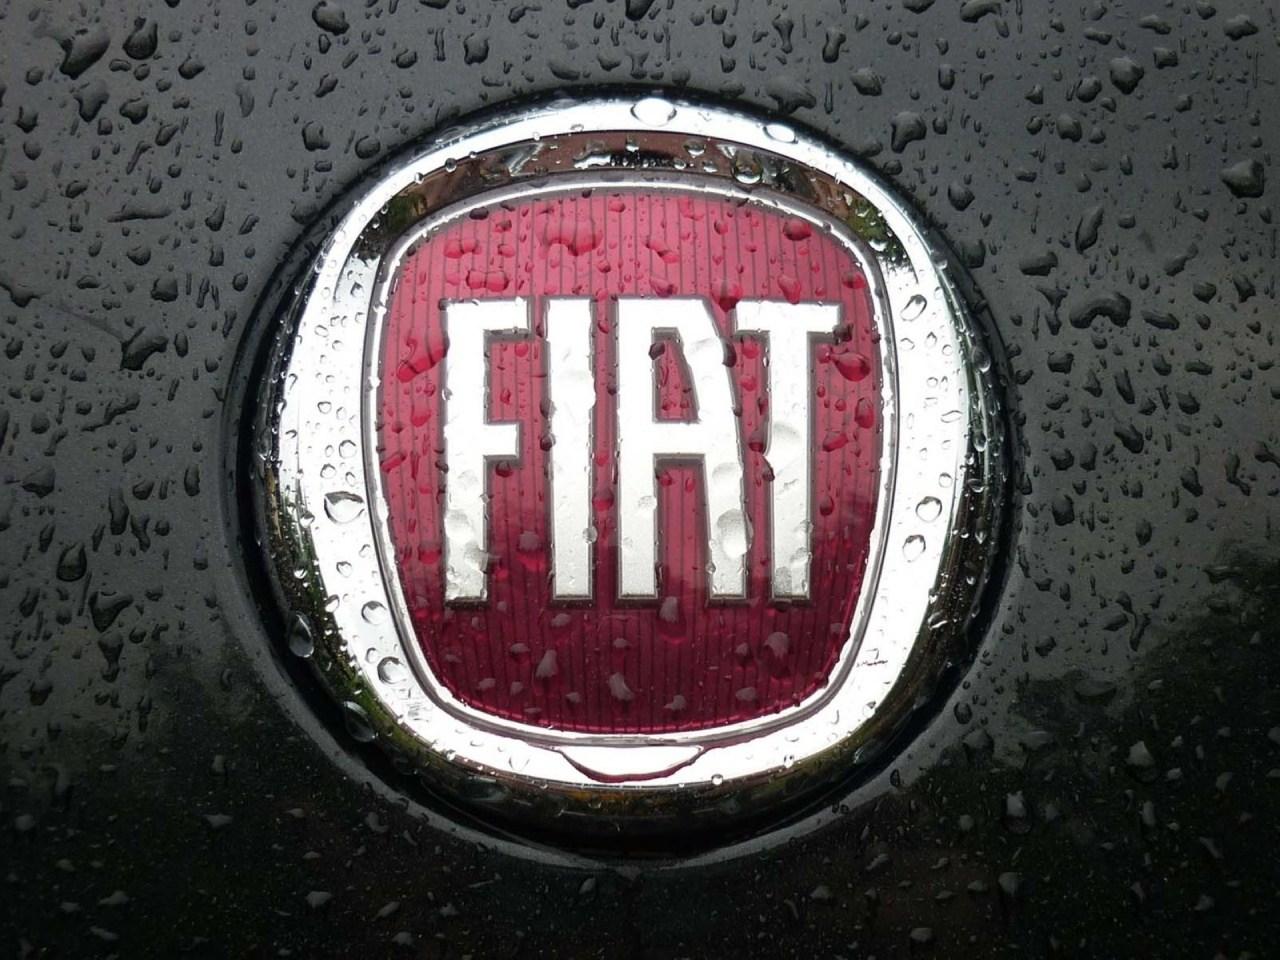 Генпрокуратура Парижа начала расследование вотношении Фиат Chrysler